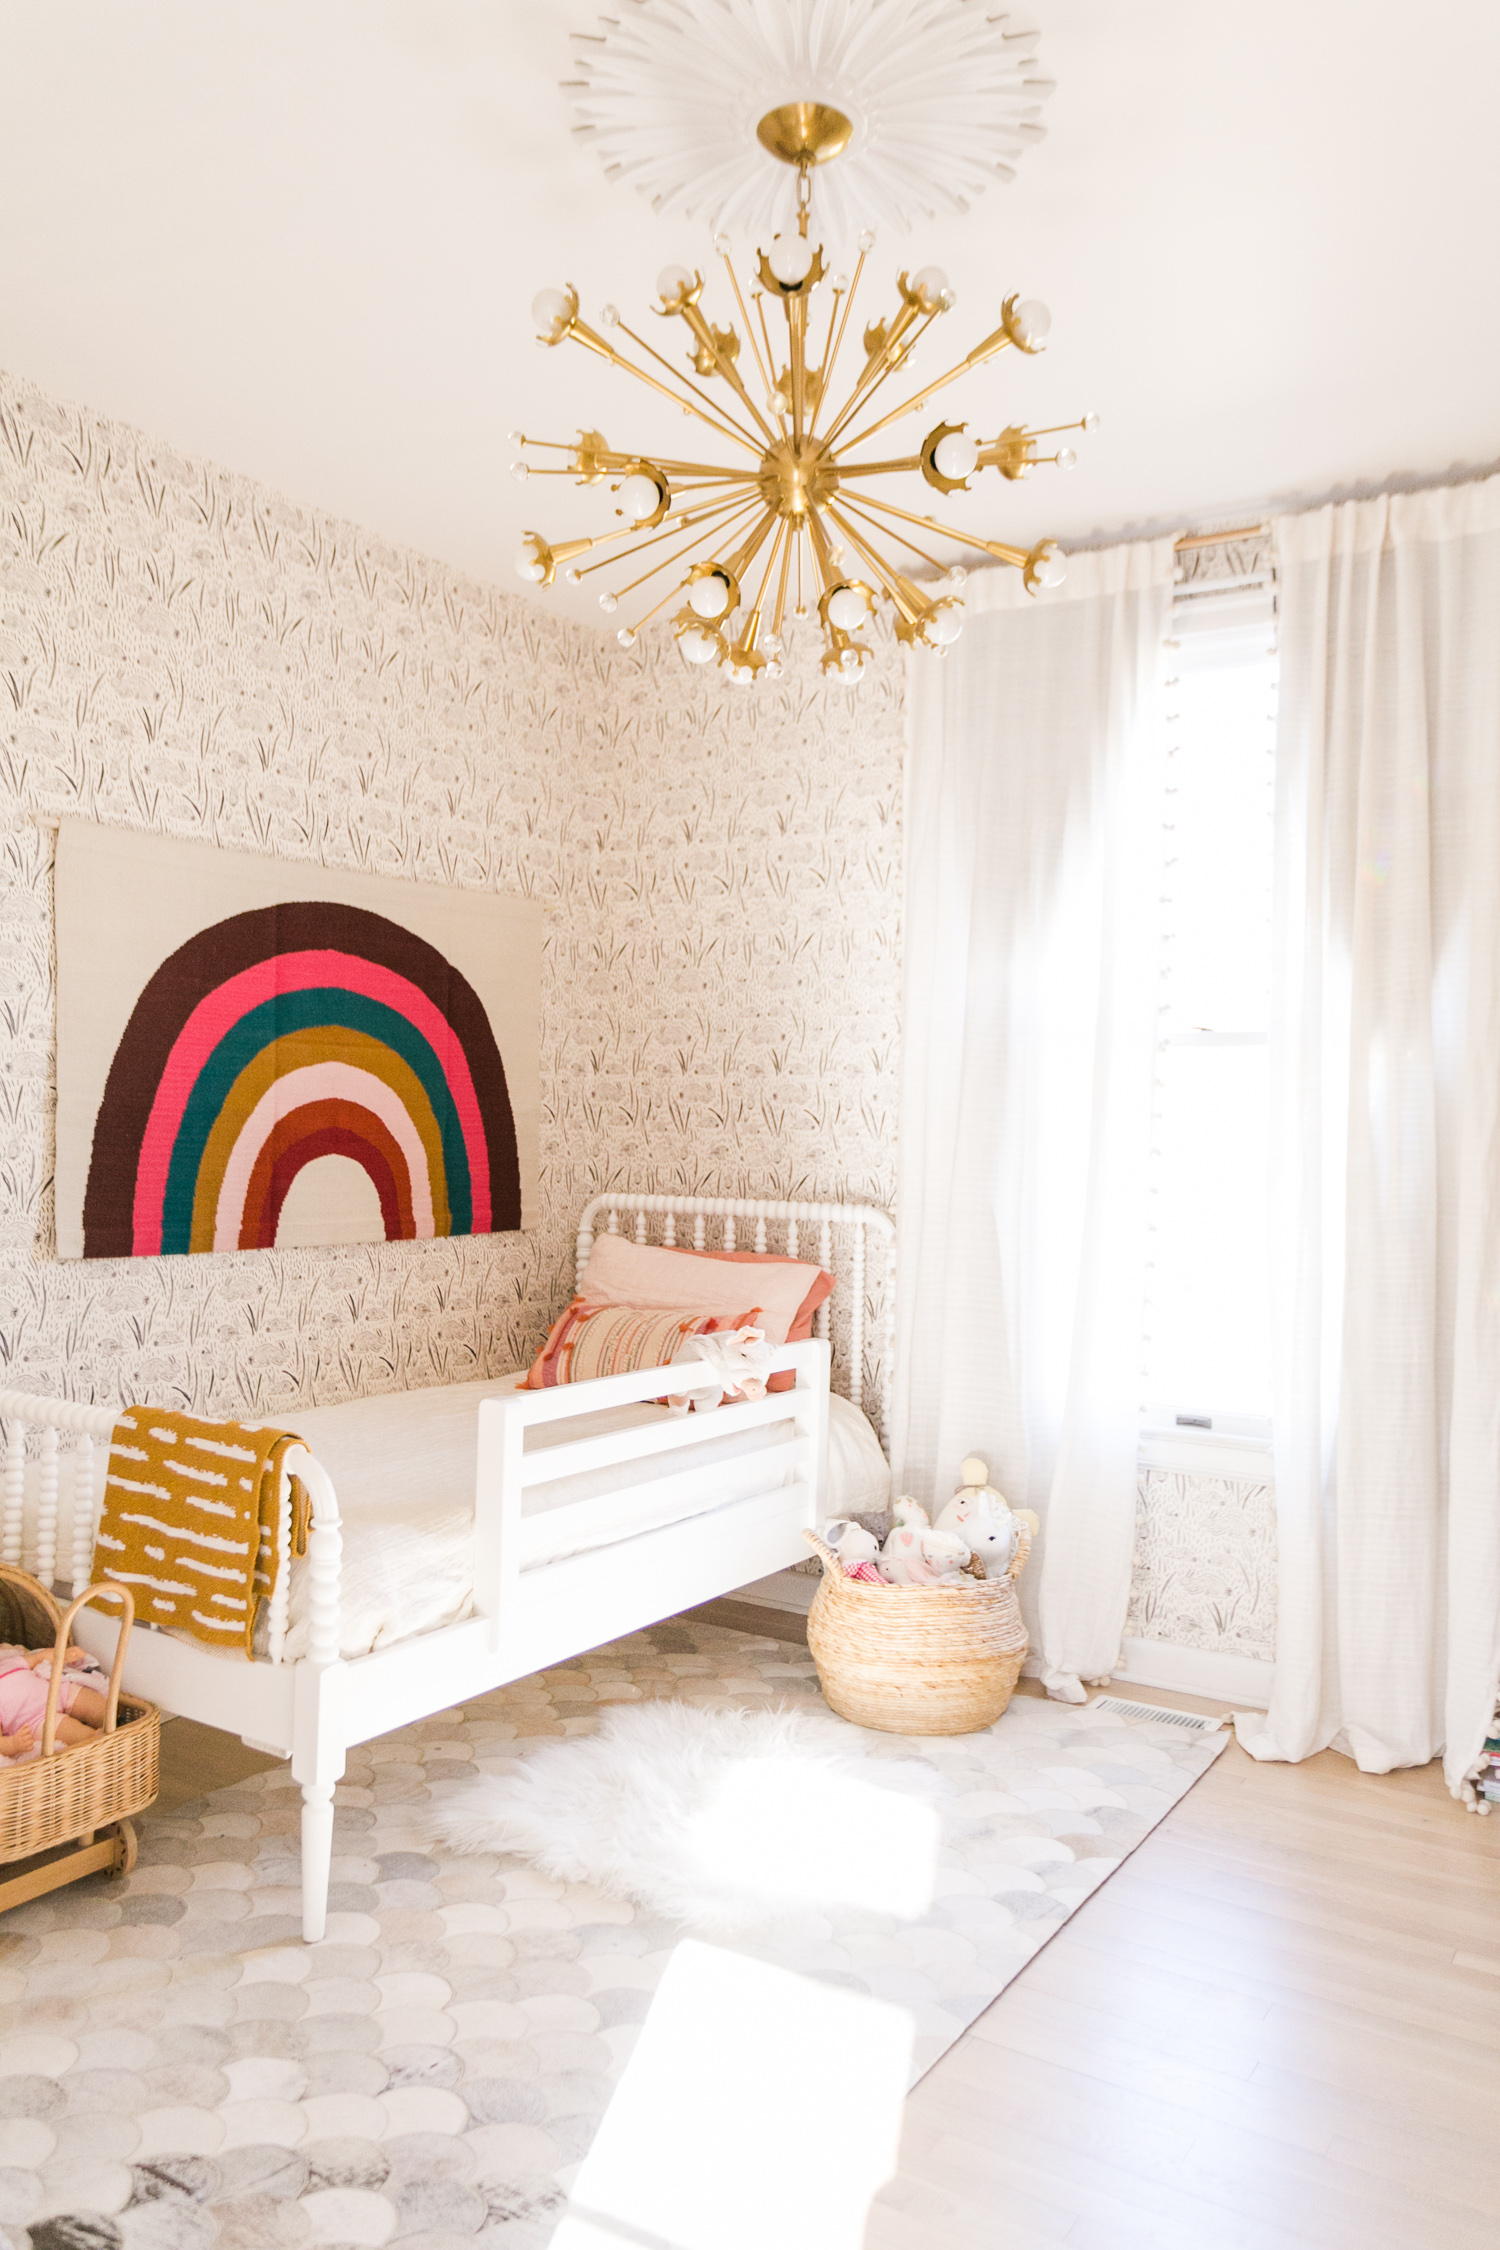 Nova's Bedroom 3.0